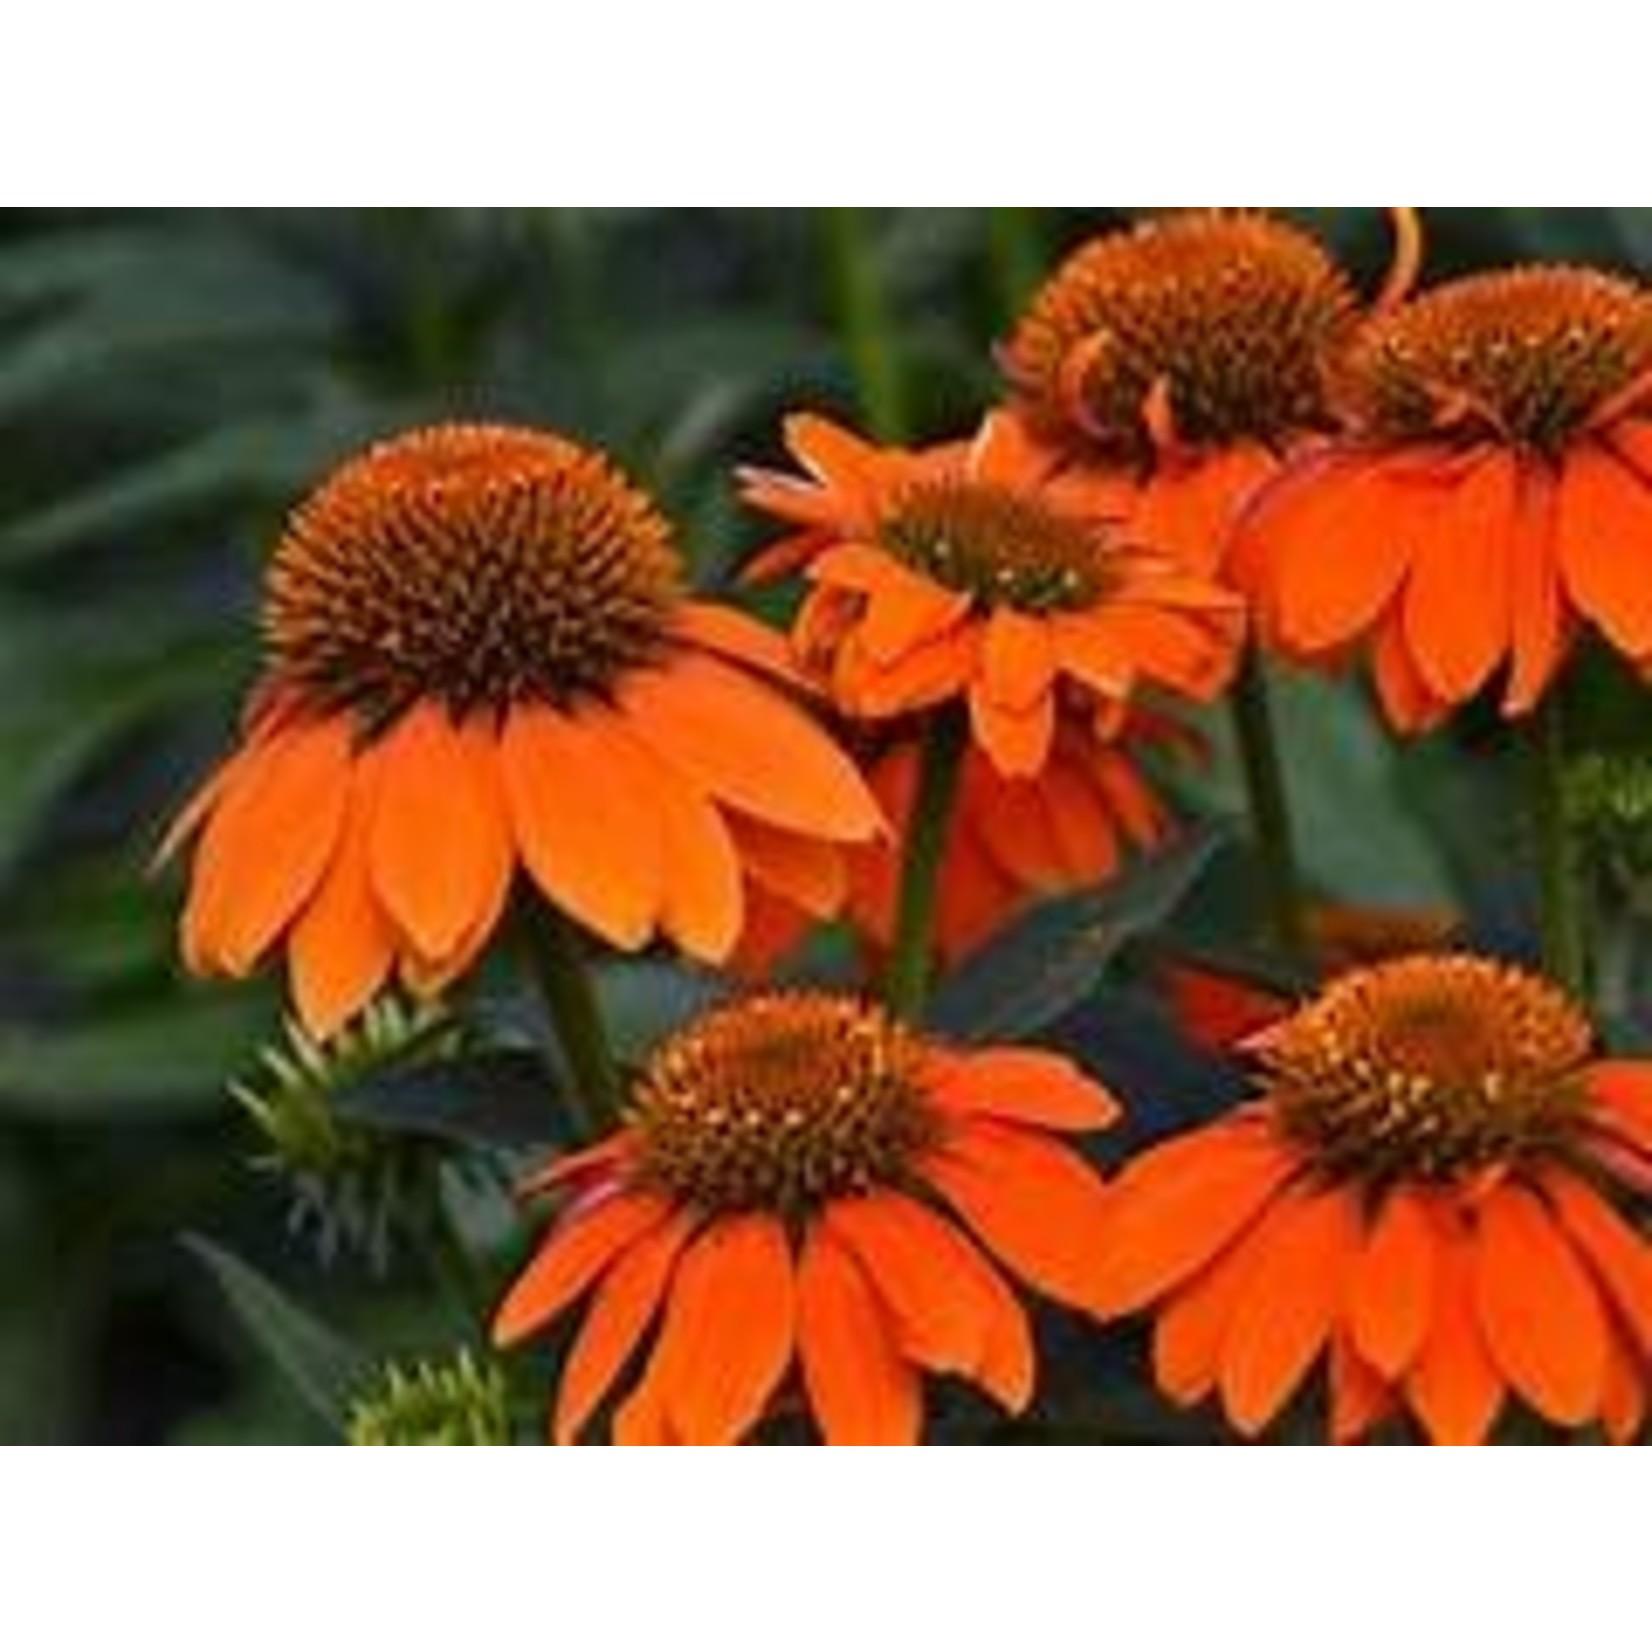 Cone Flower 'Echinacea Sombrero Adobe Orange' - 2 gal